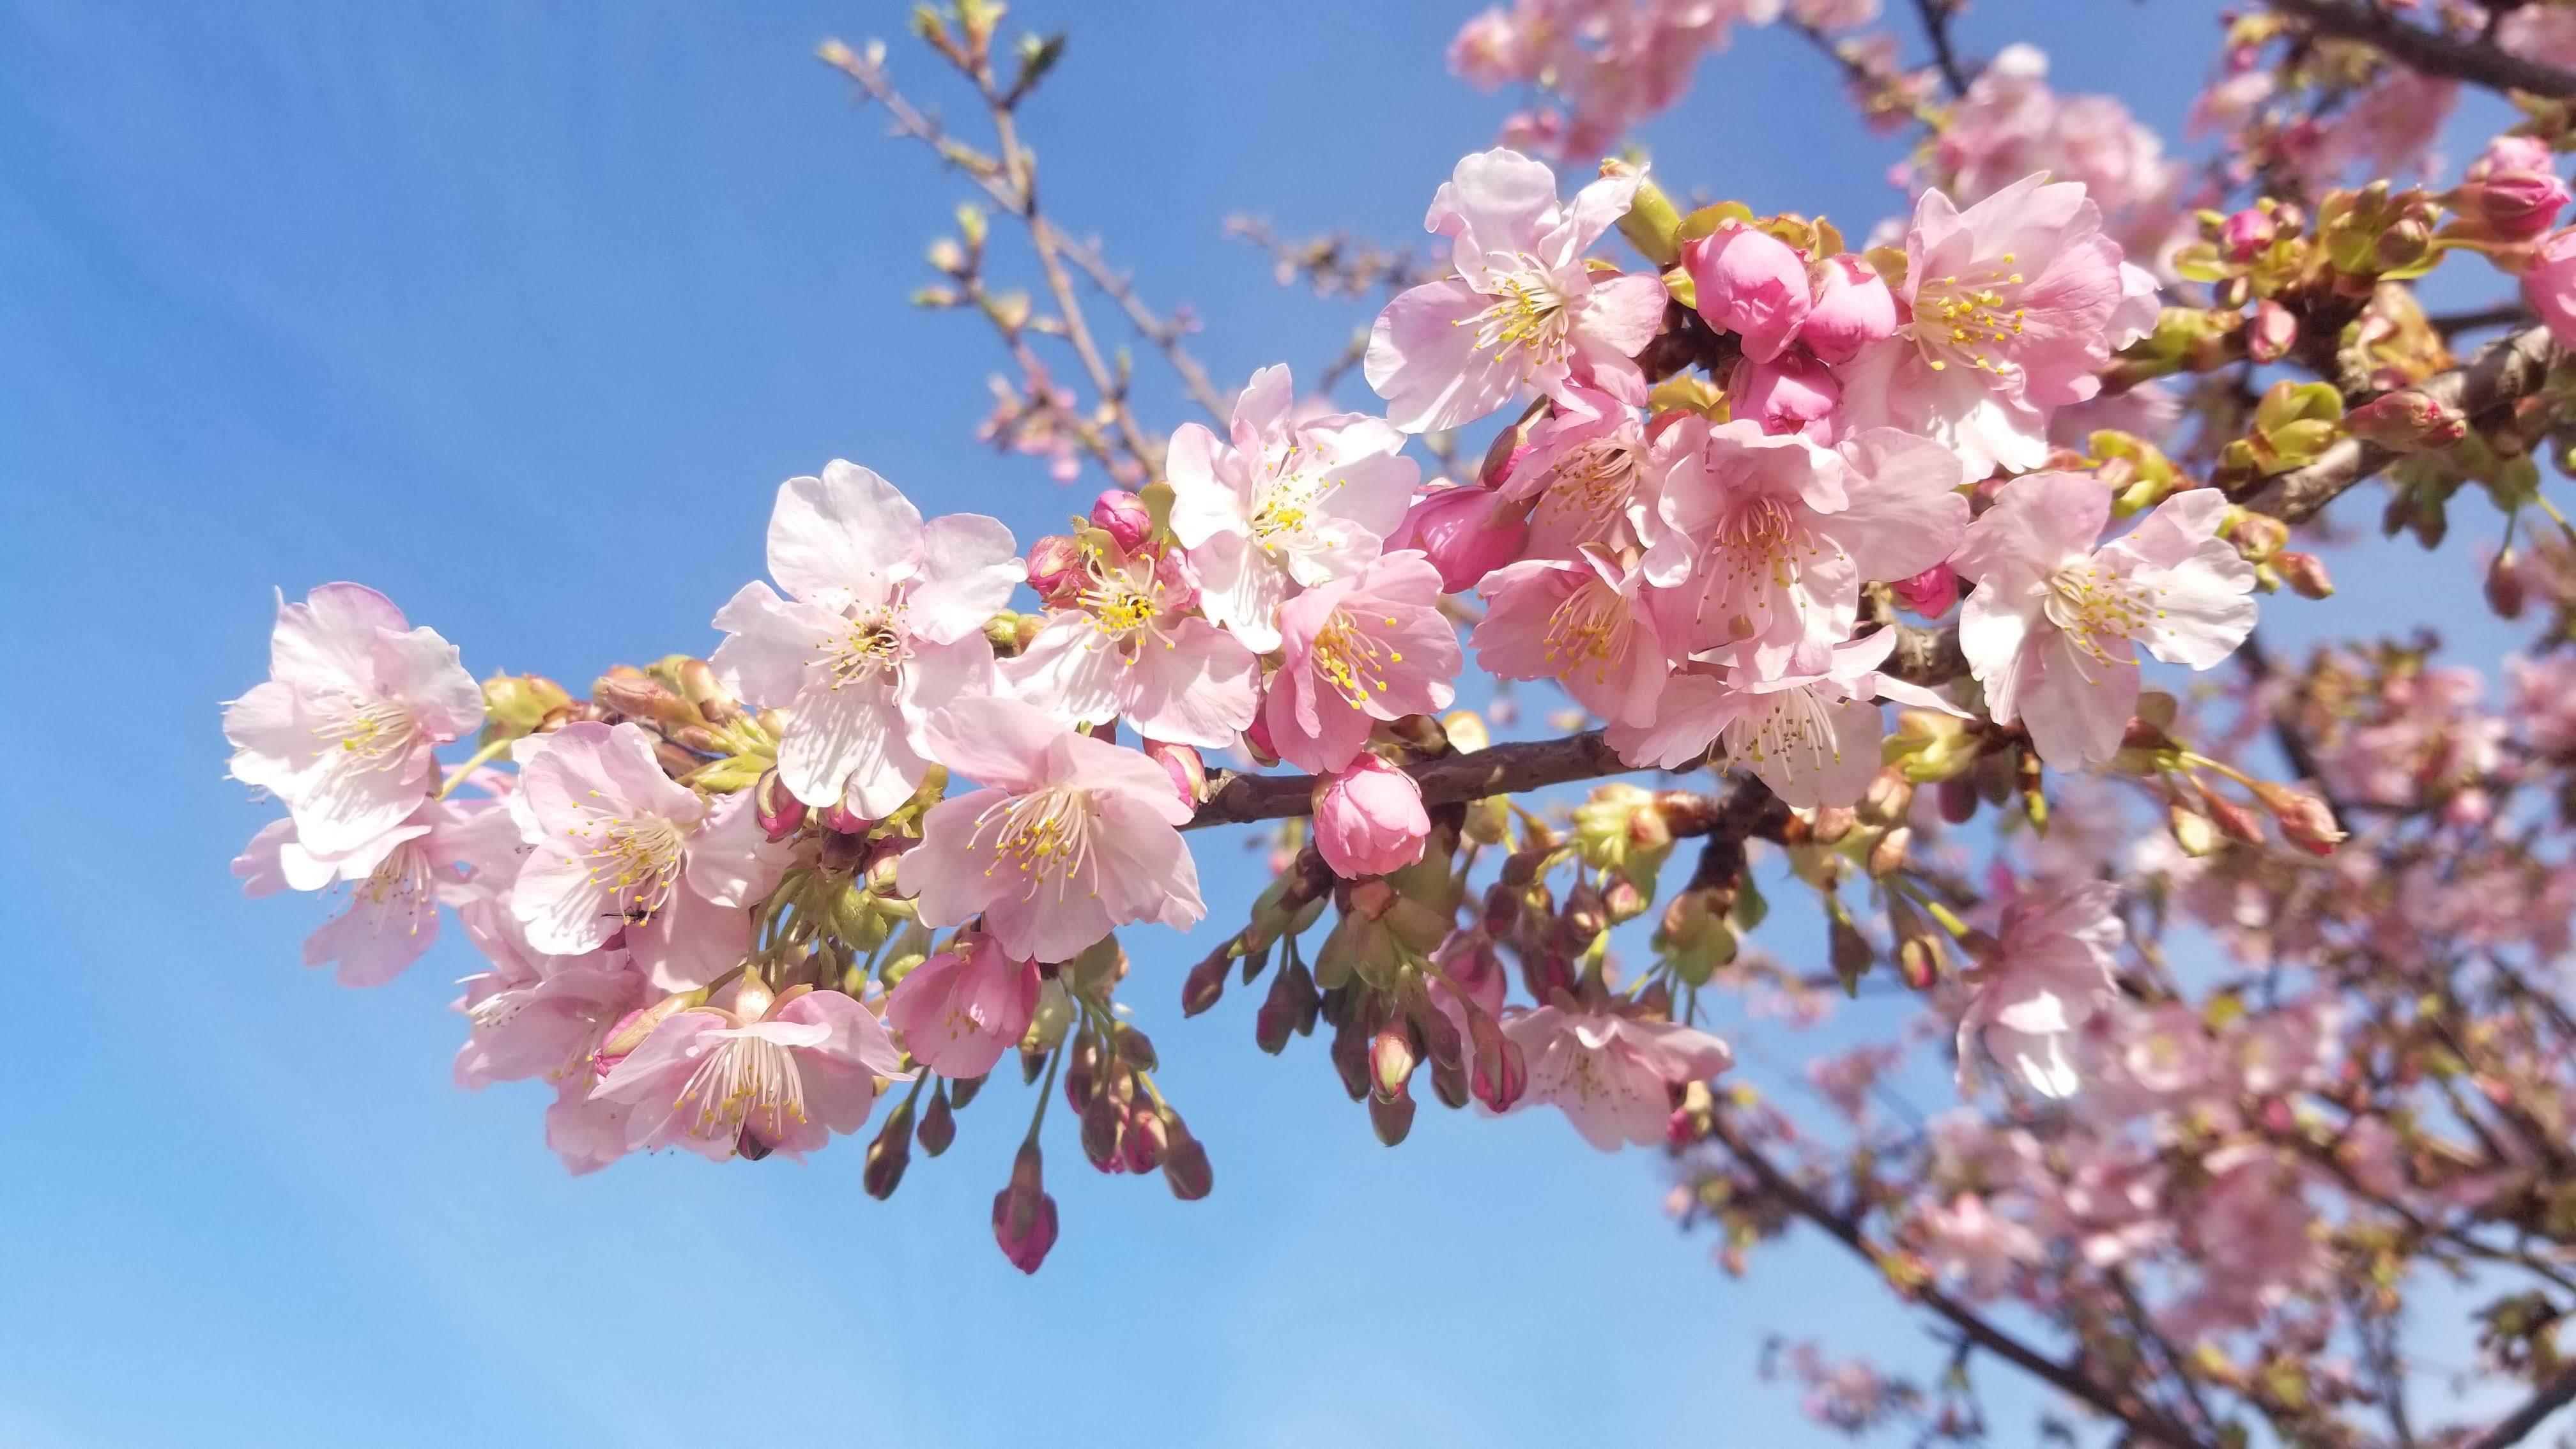 河津桜の定点観測_e0202348_20384452.jpg